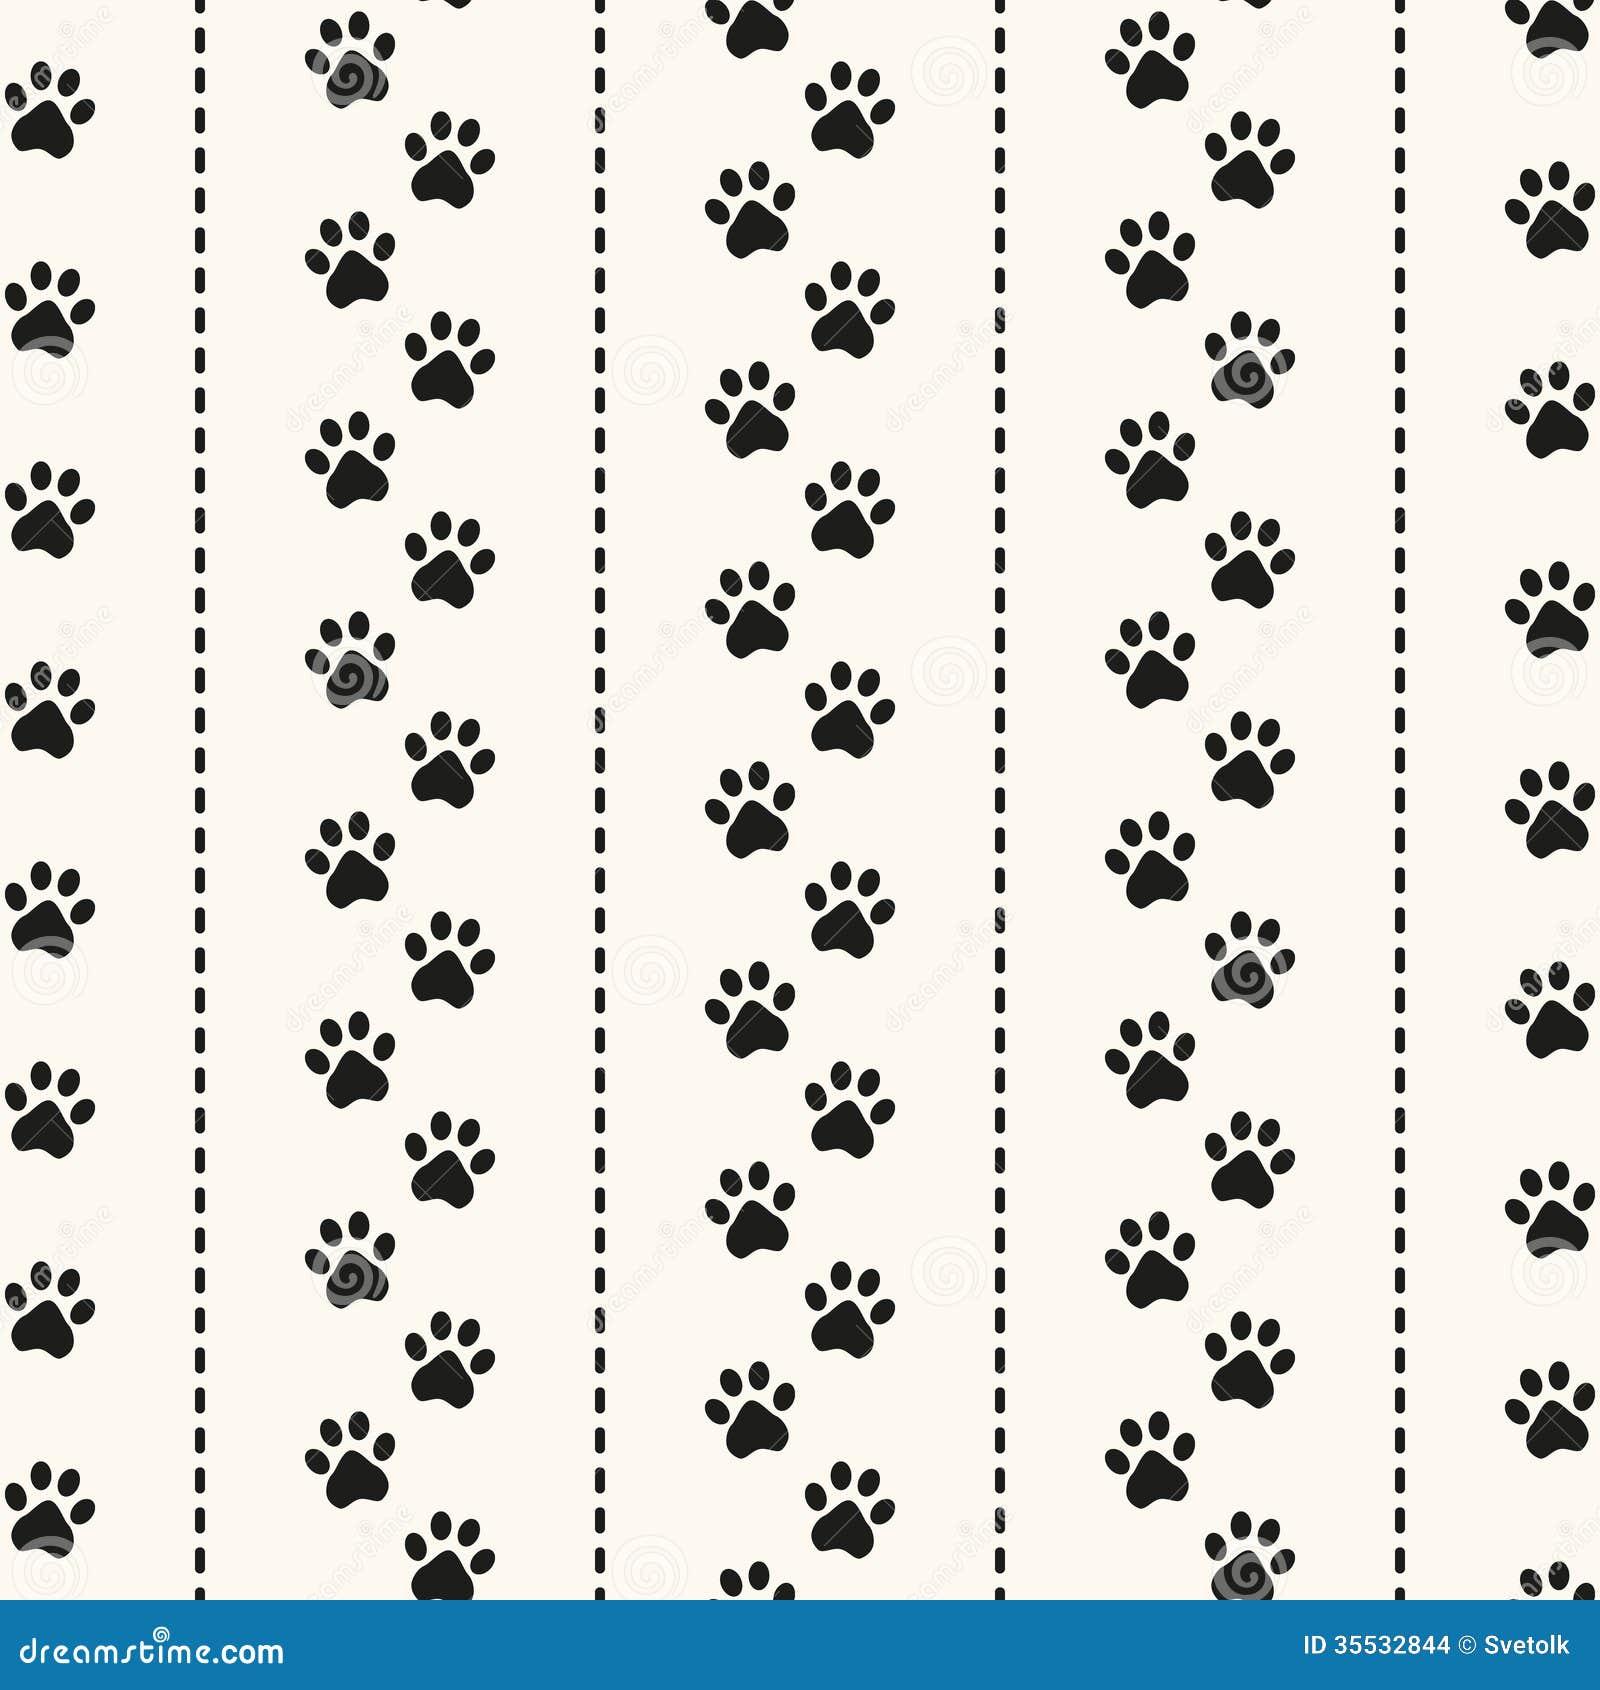 Animal foot prints patterns - photo#28